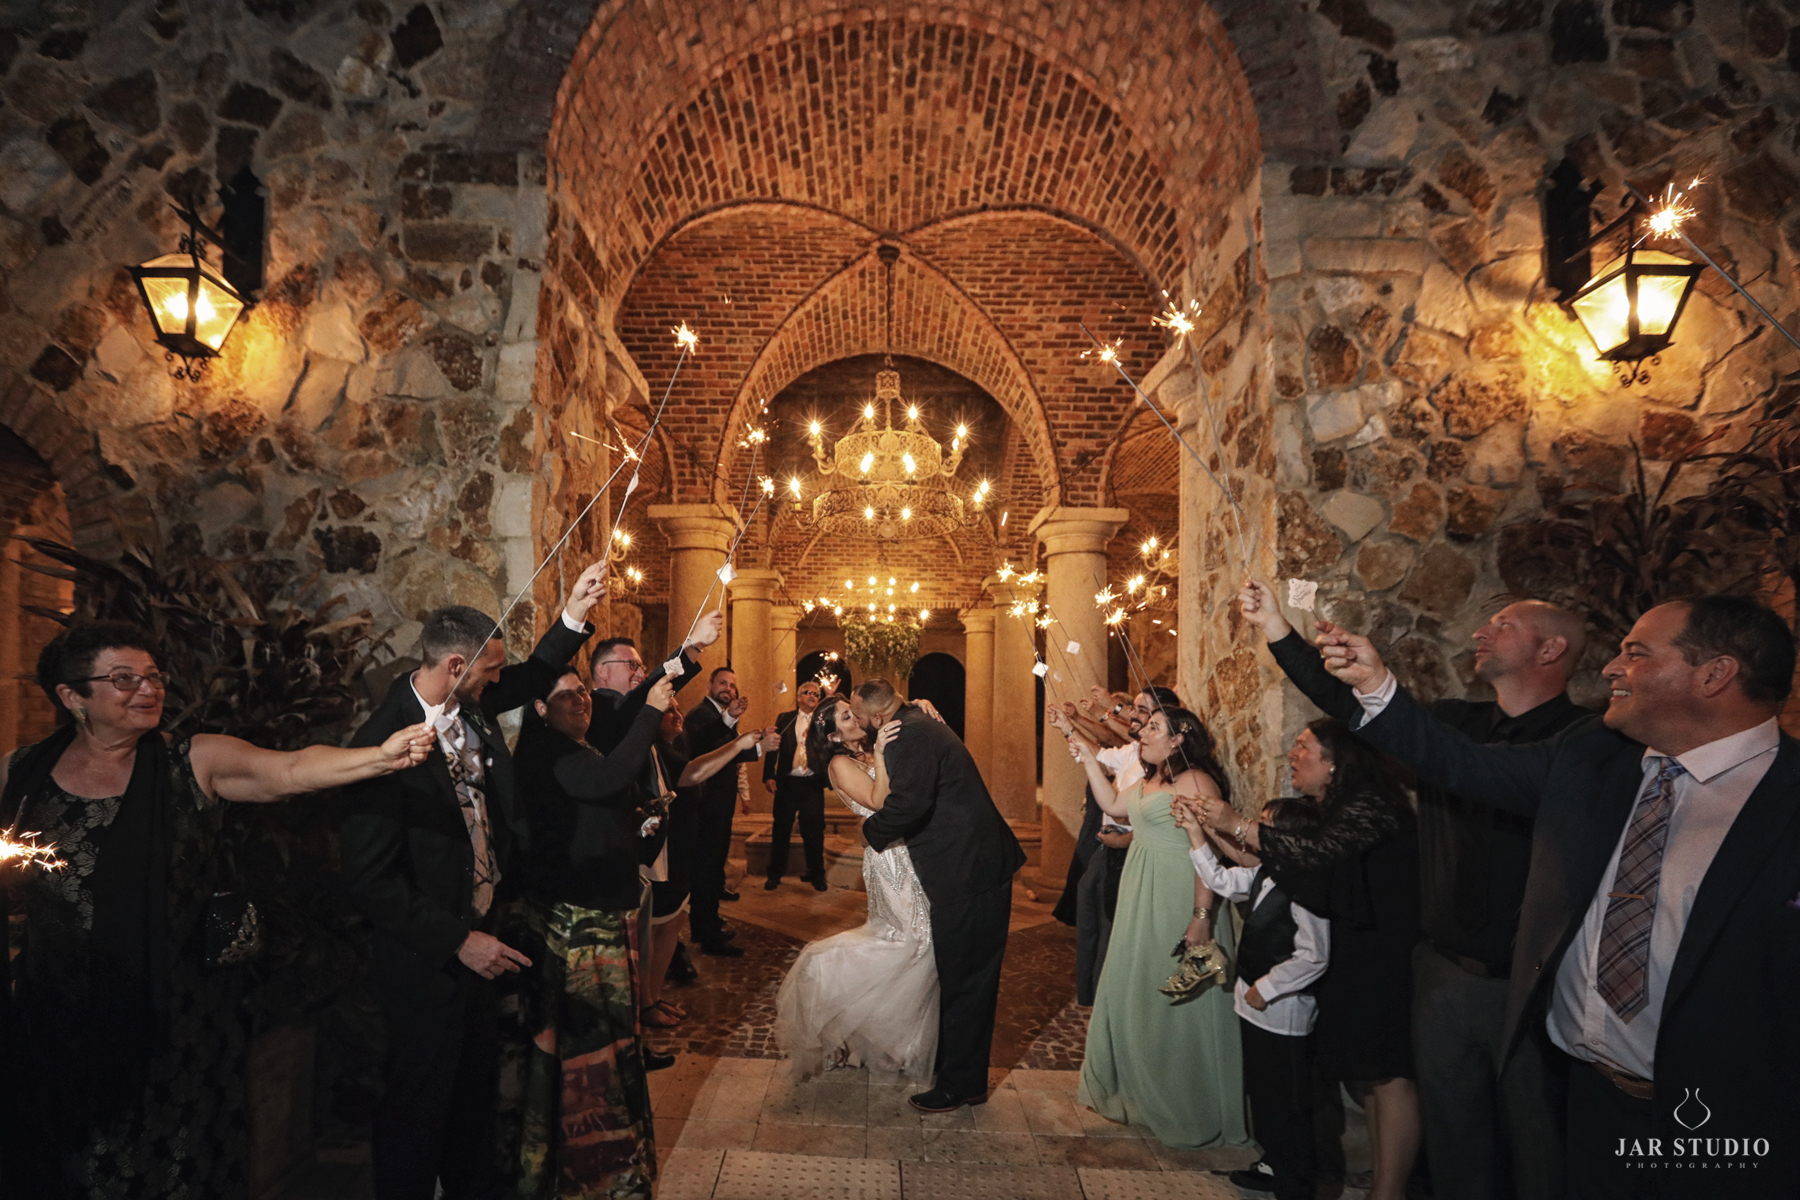 44-romantic-fun-wedding-reception-jaime-photographer.jpg